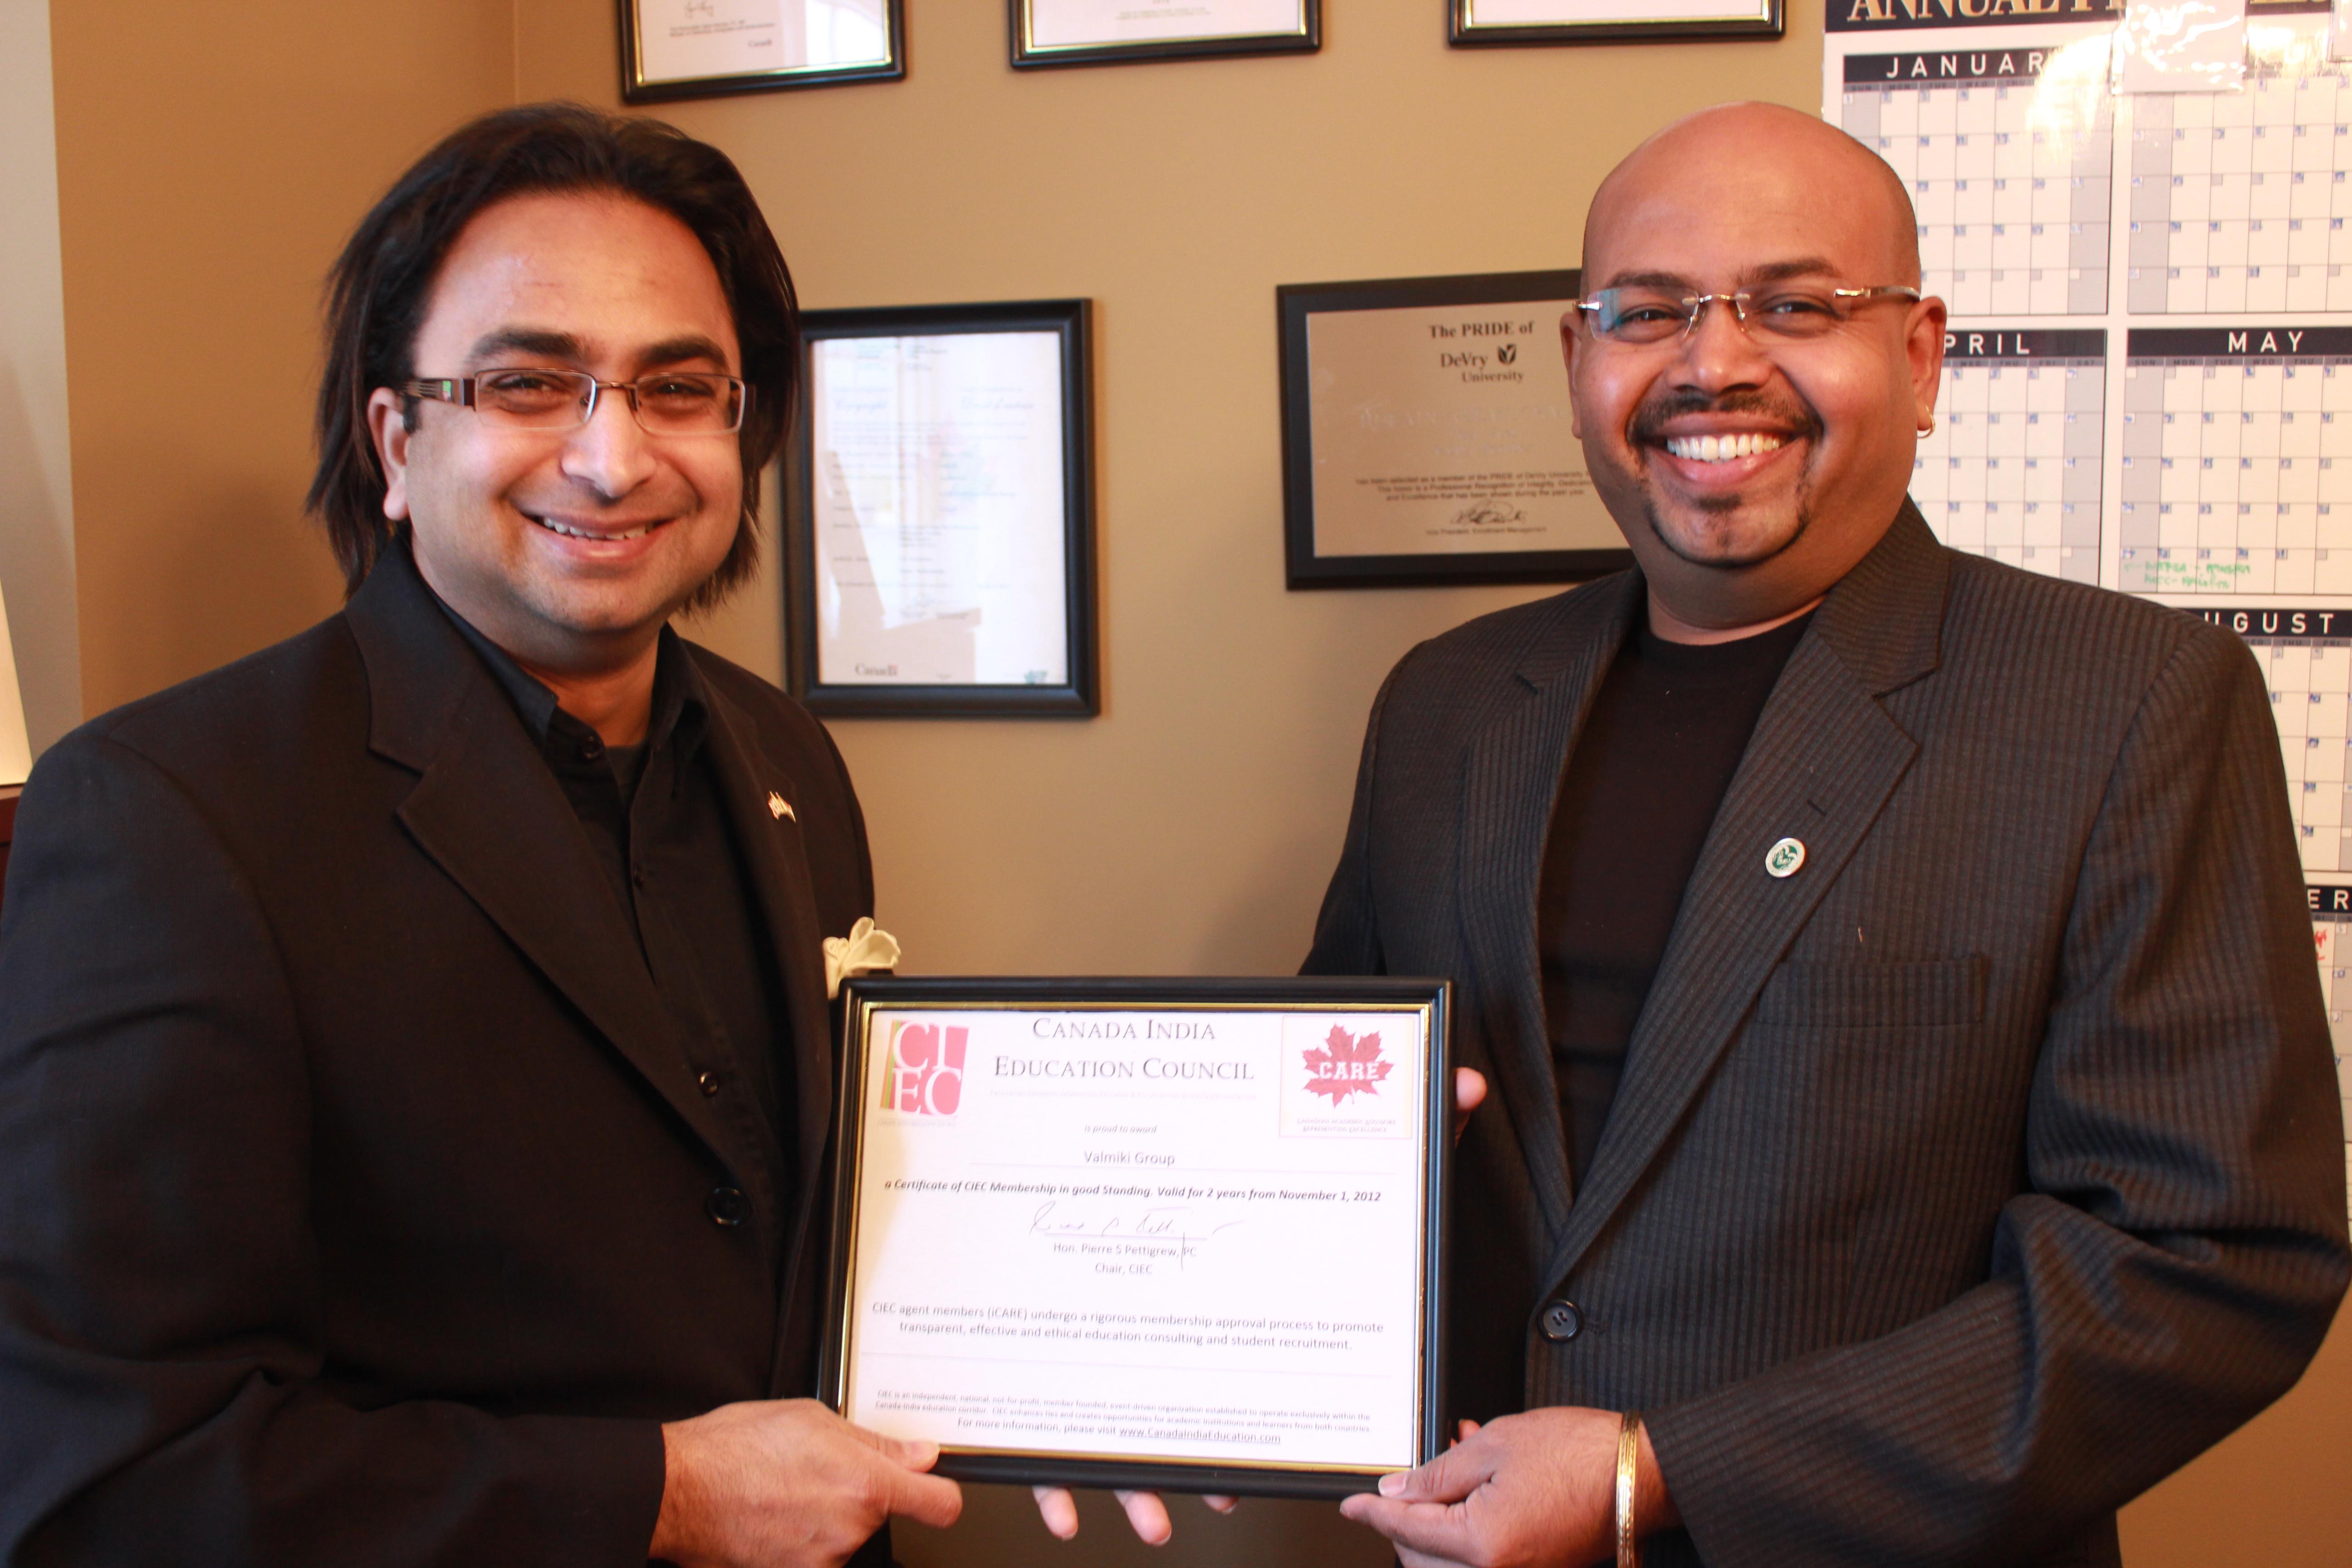 Valmiki Receives Certificate of CIEC Membership